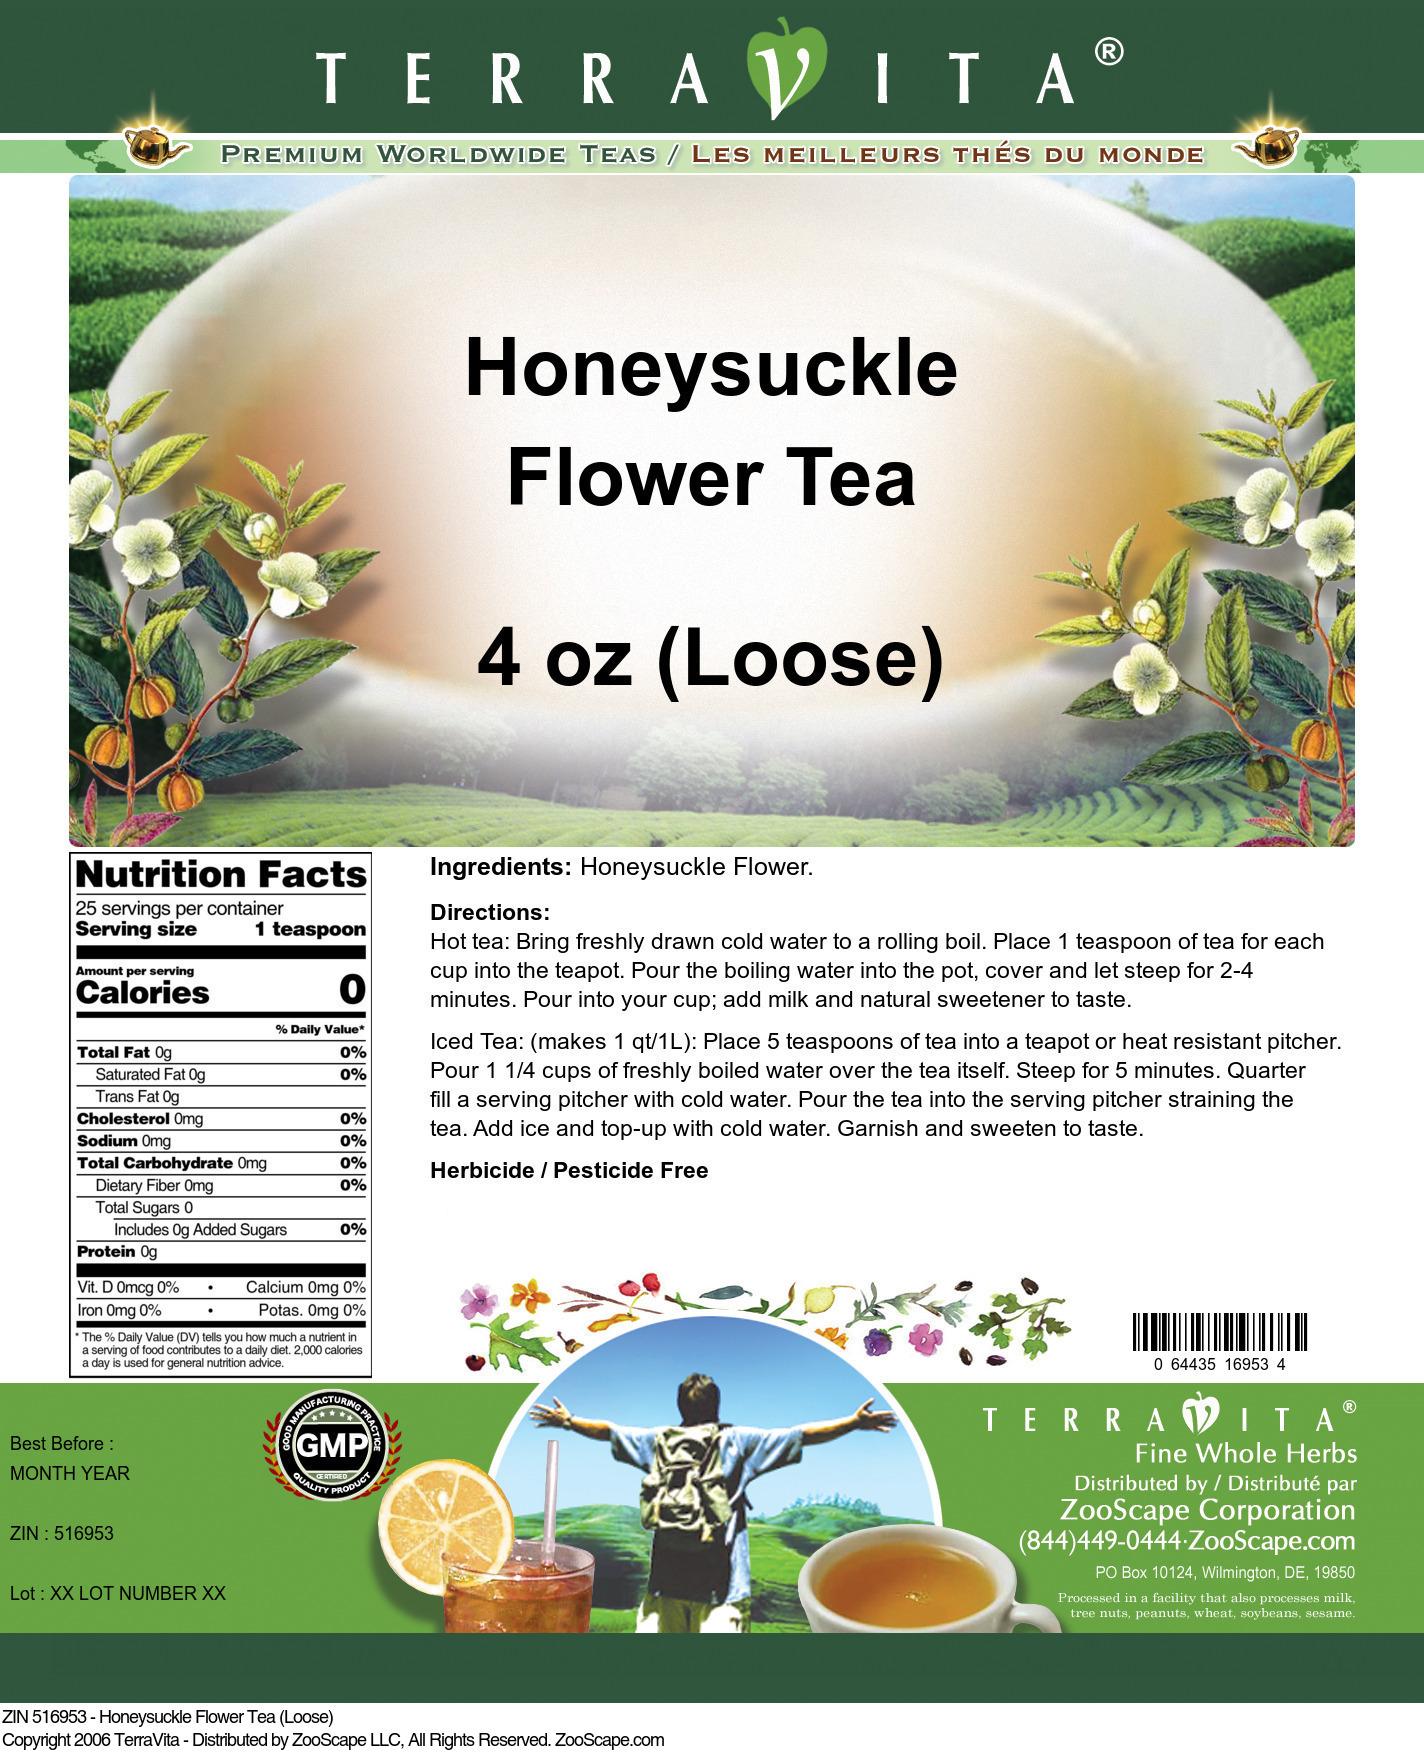 Honeysuckle Flower Tea (Loose)